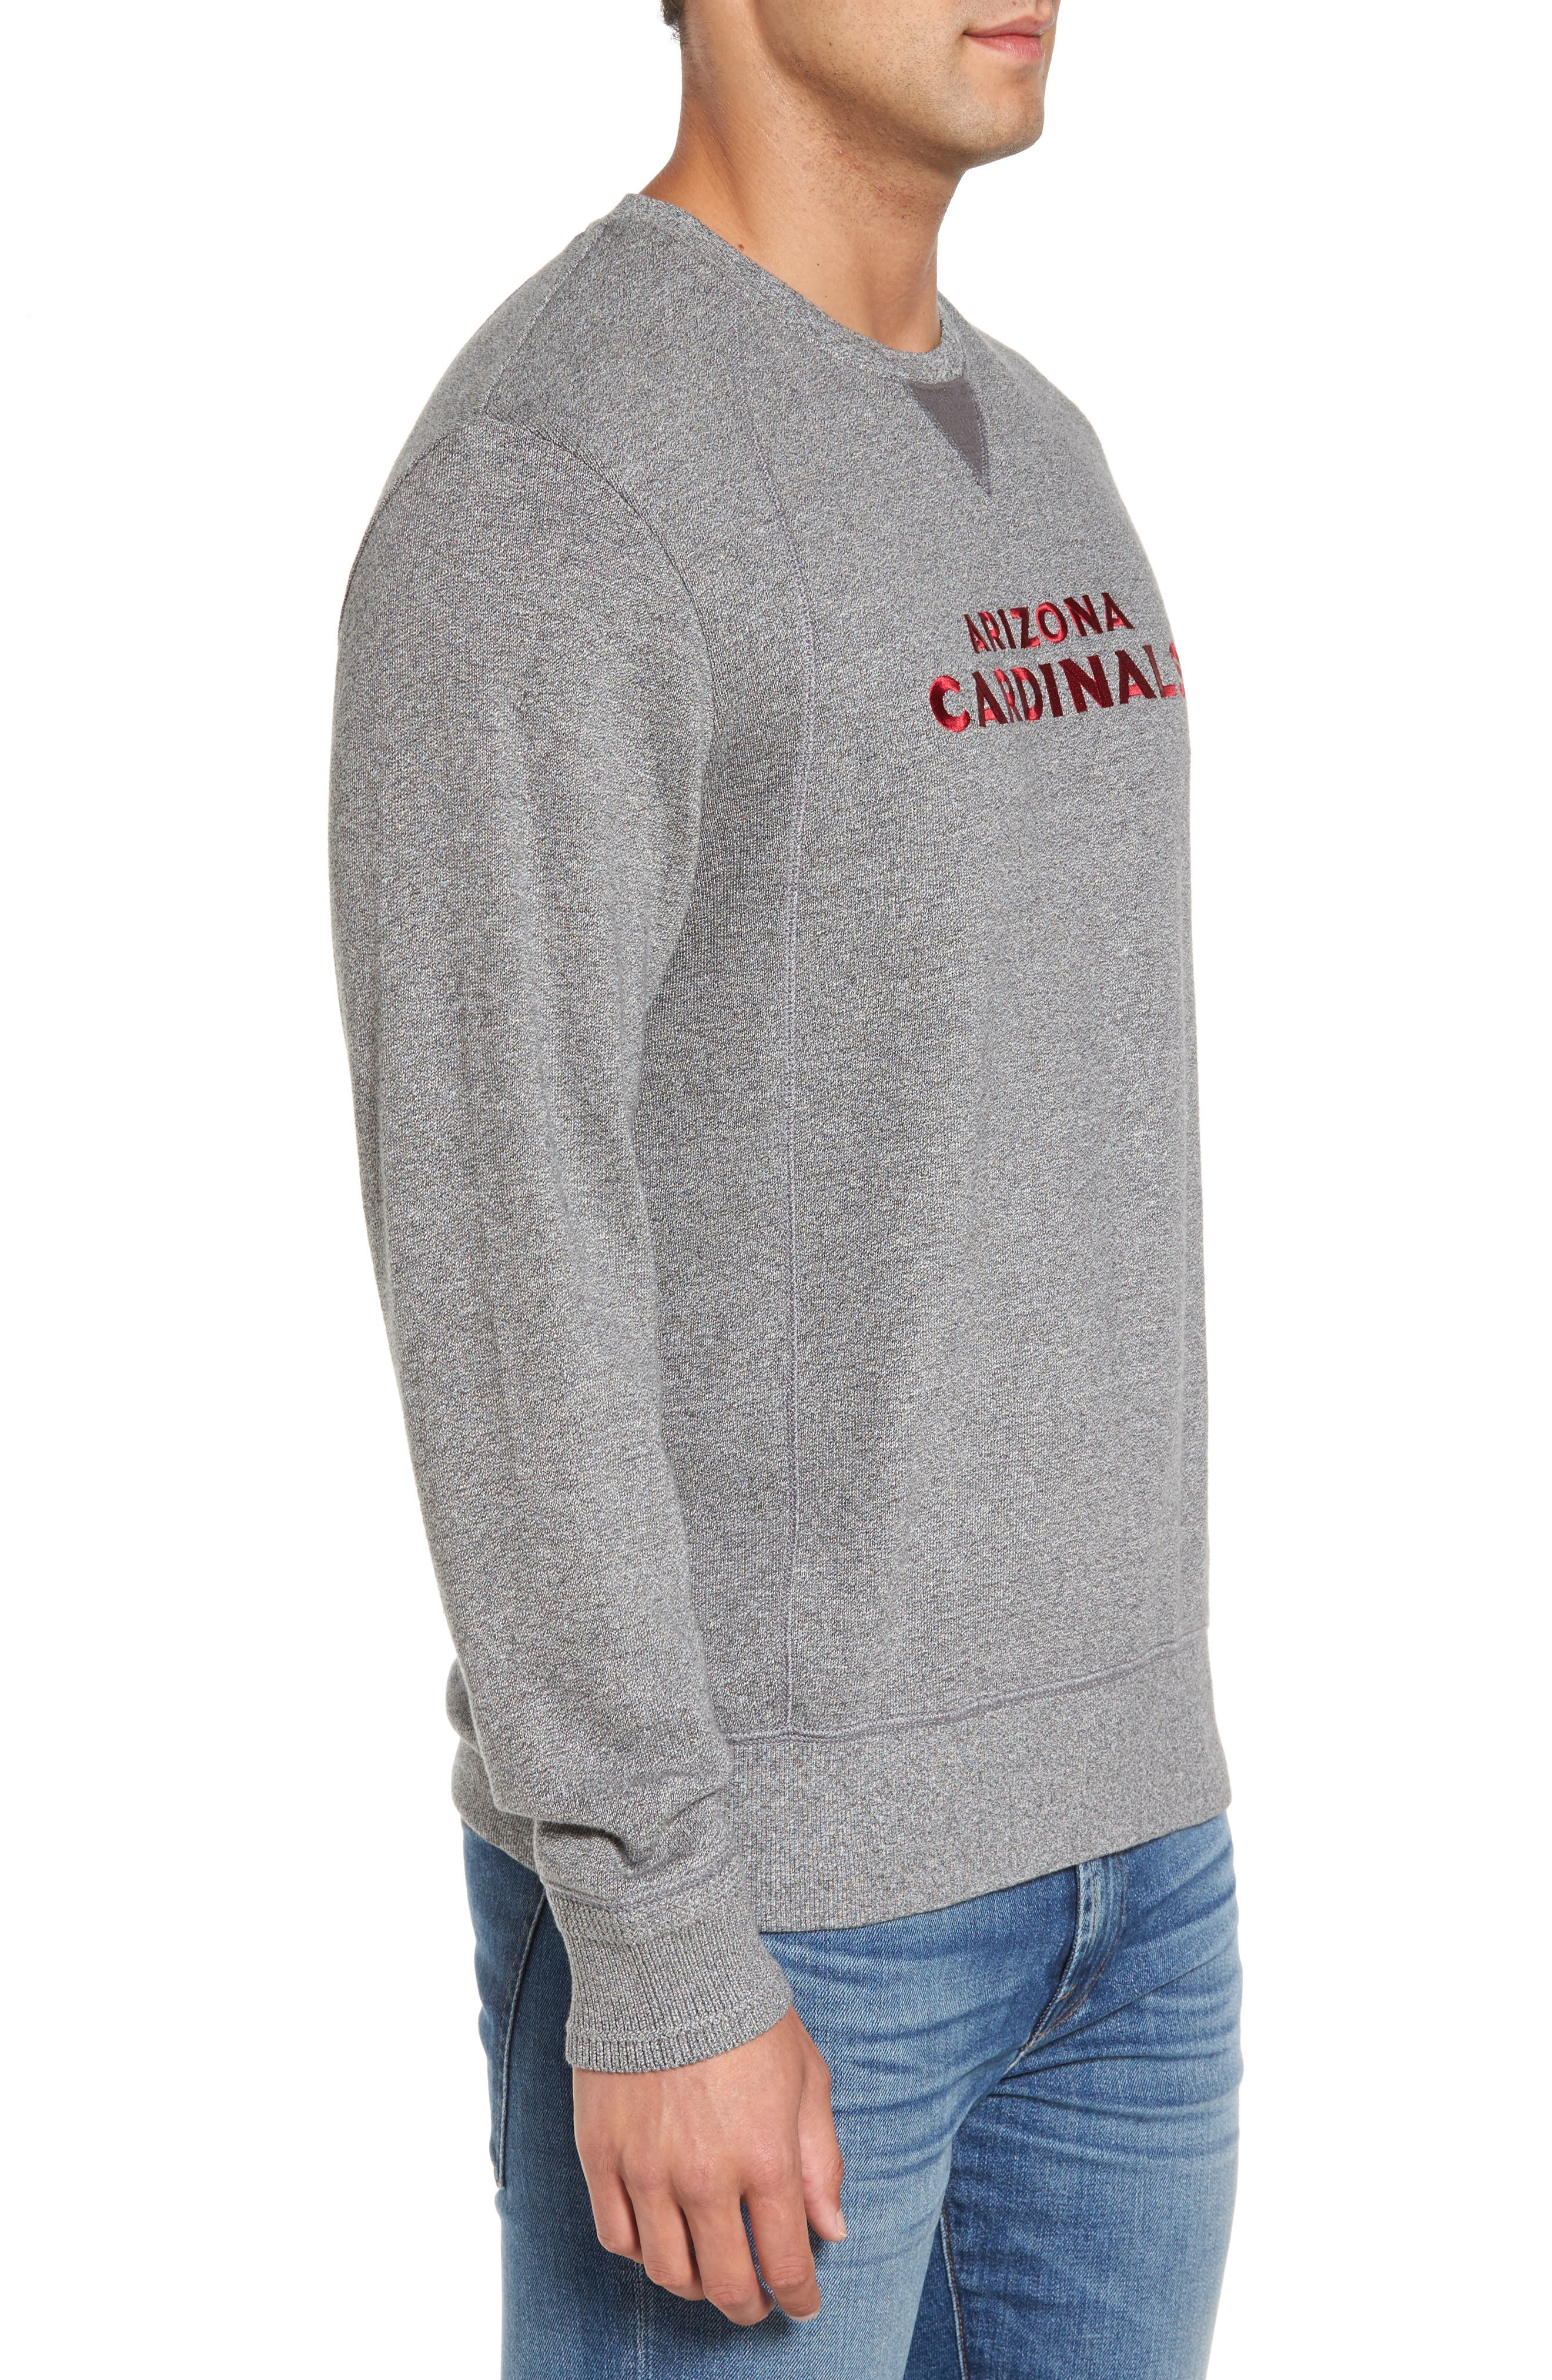 NFL Stitch of Liberty Embroidered Crewneck Sweatshirt,                             Alternate thumbnail 64, color,